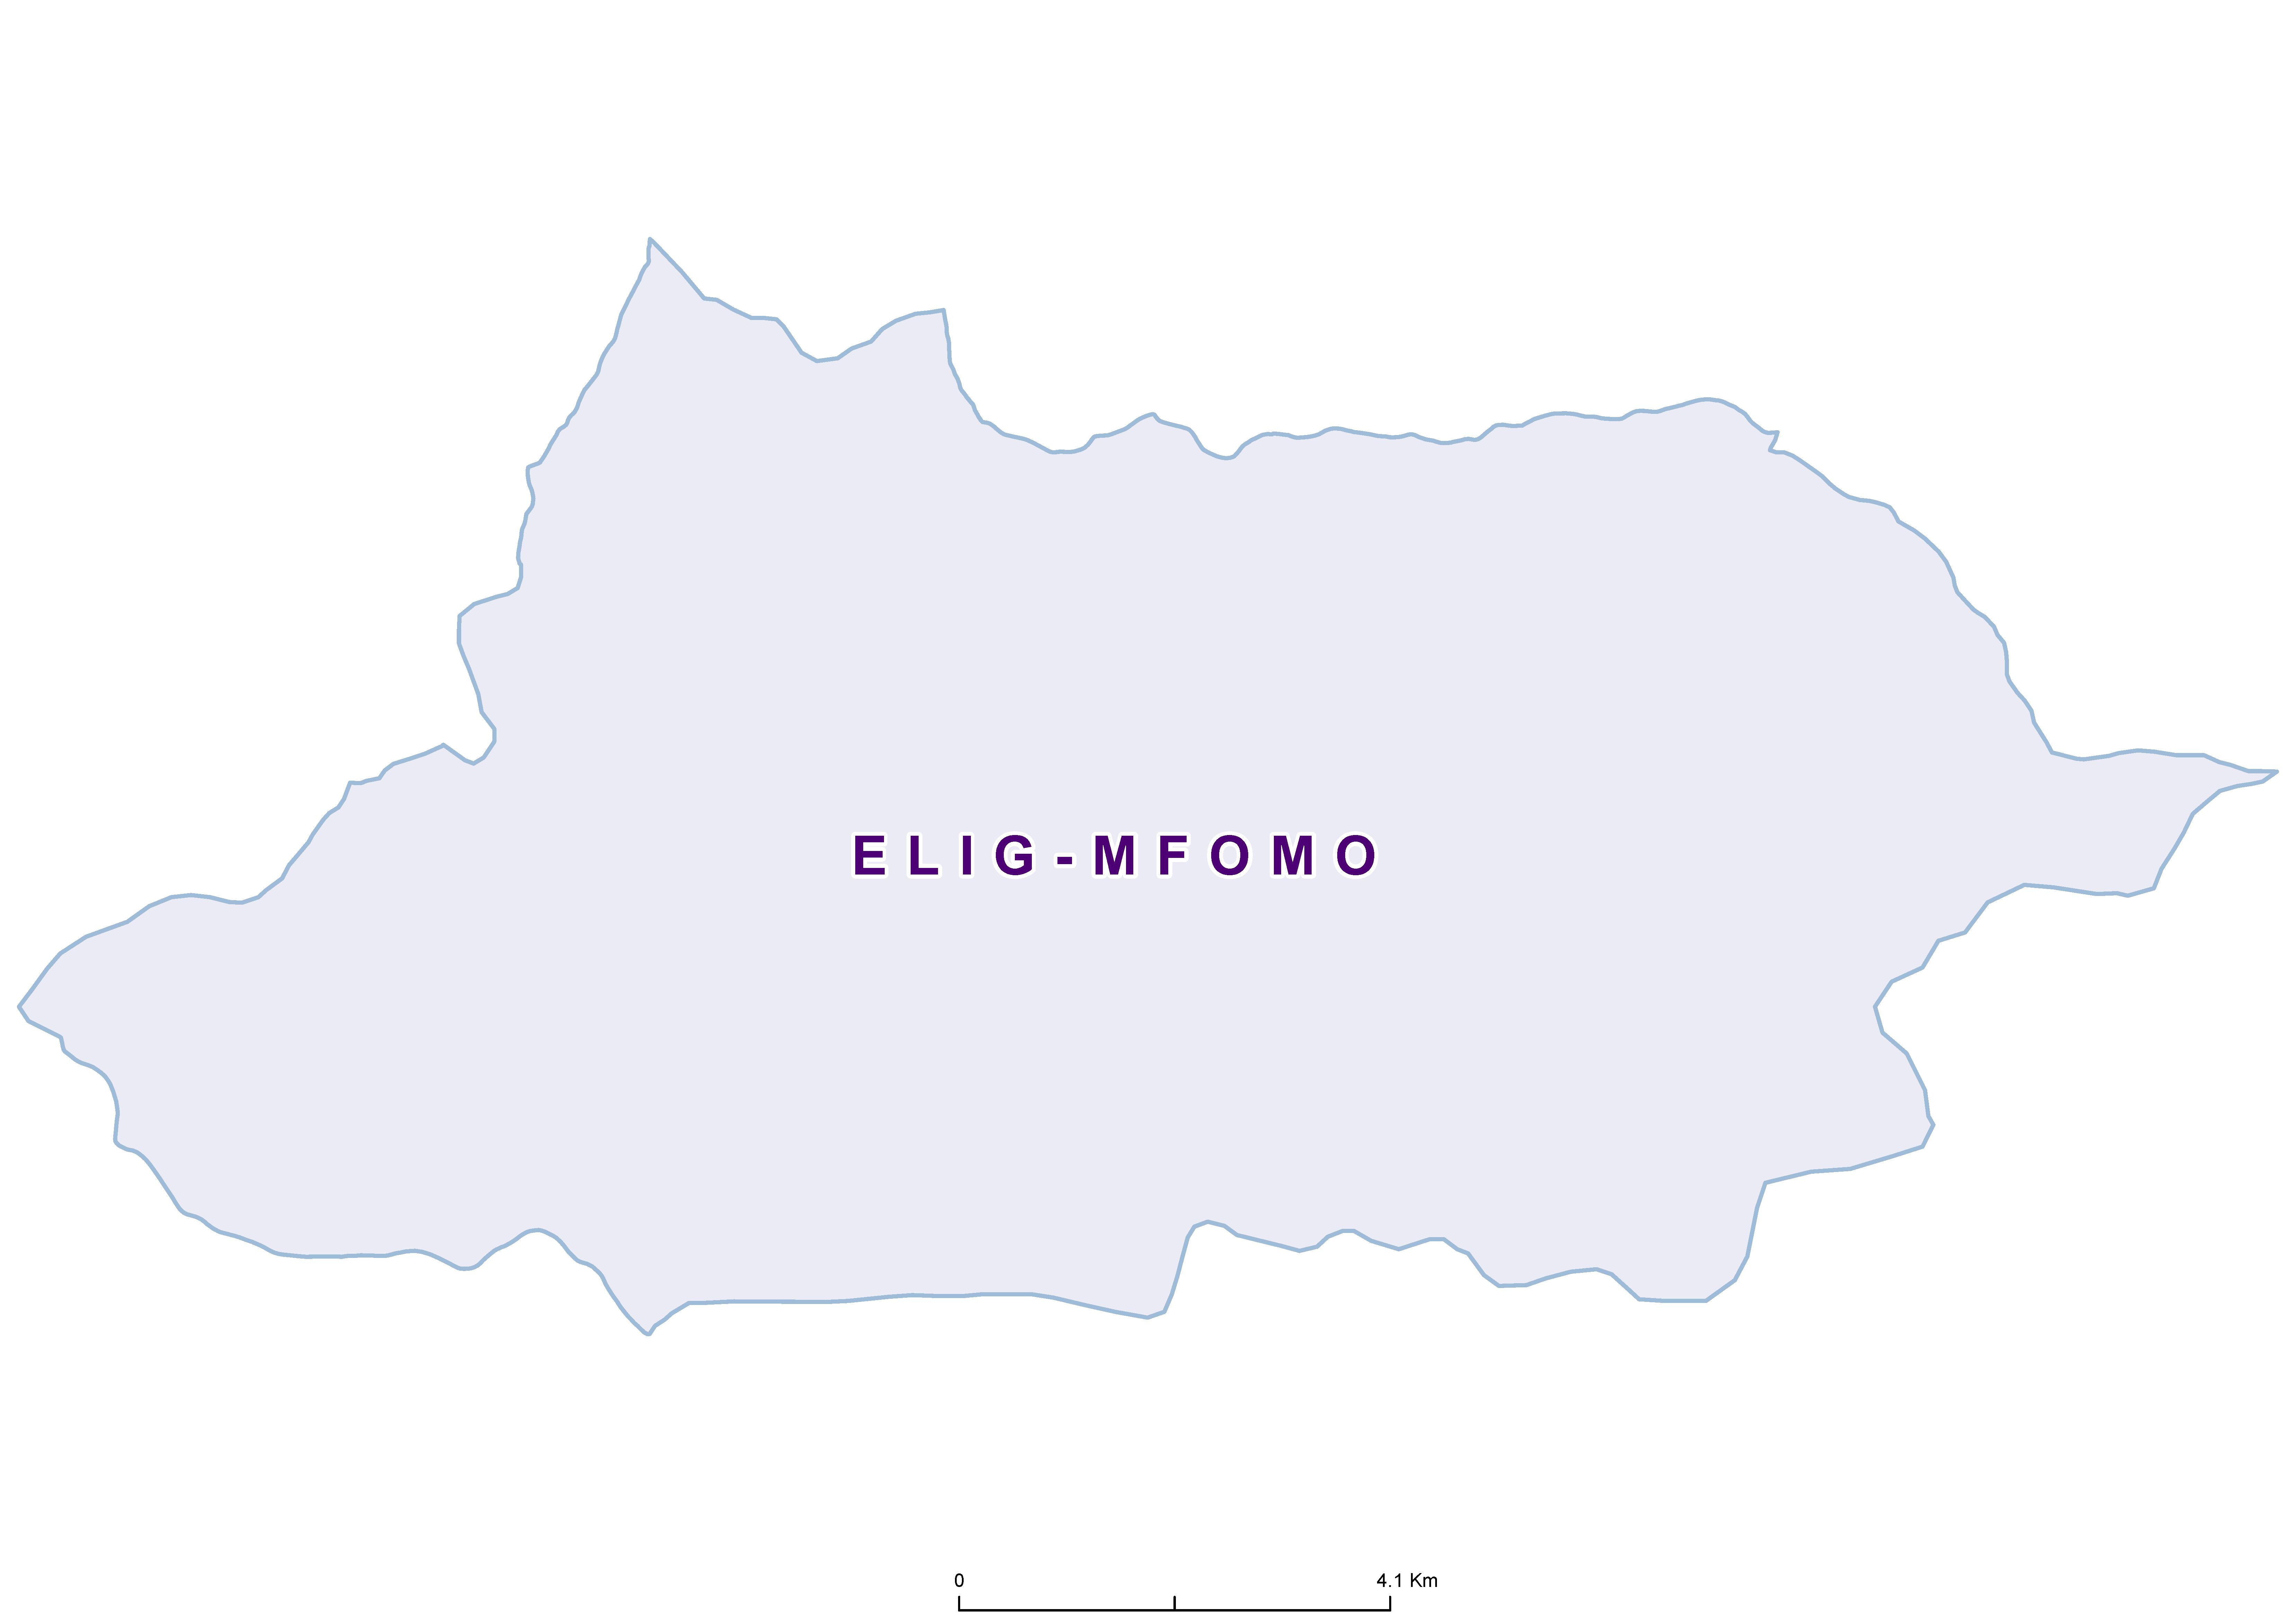 Elig-mfomo Mean SCH 19850001